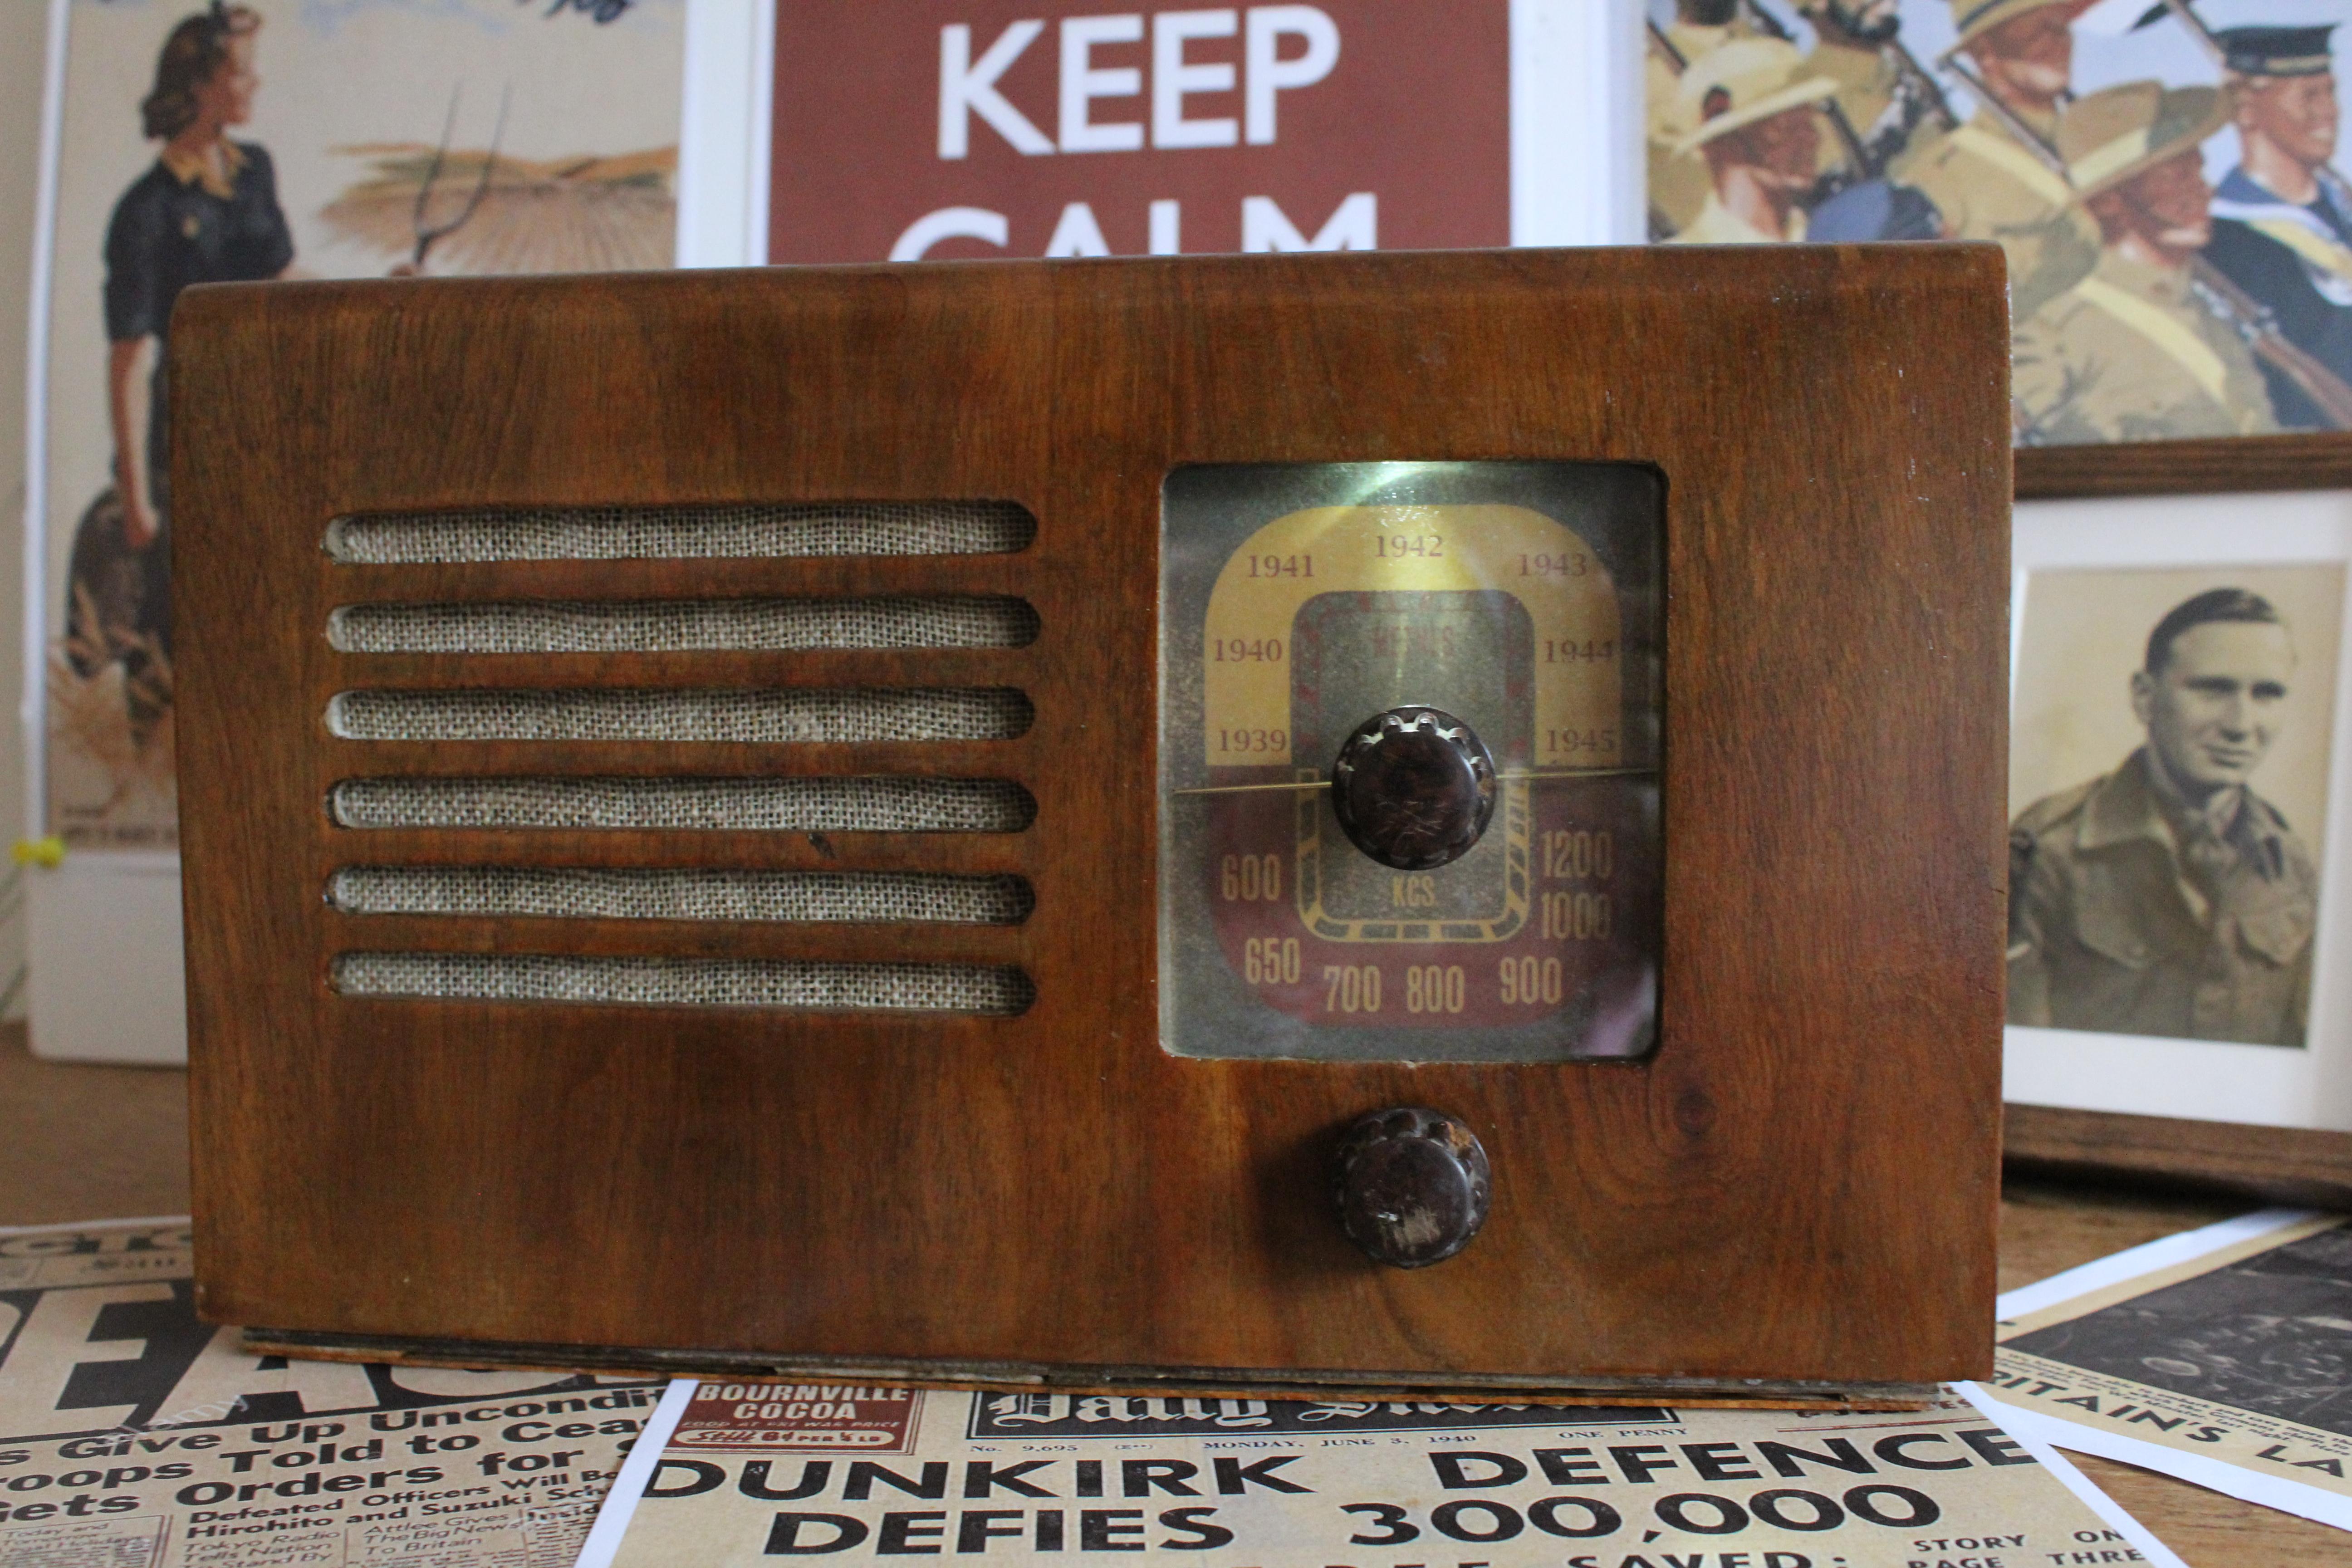 Listen to World War II radio recordings with a Raspberry Pi Zero - Raspberry Pi